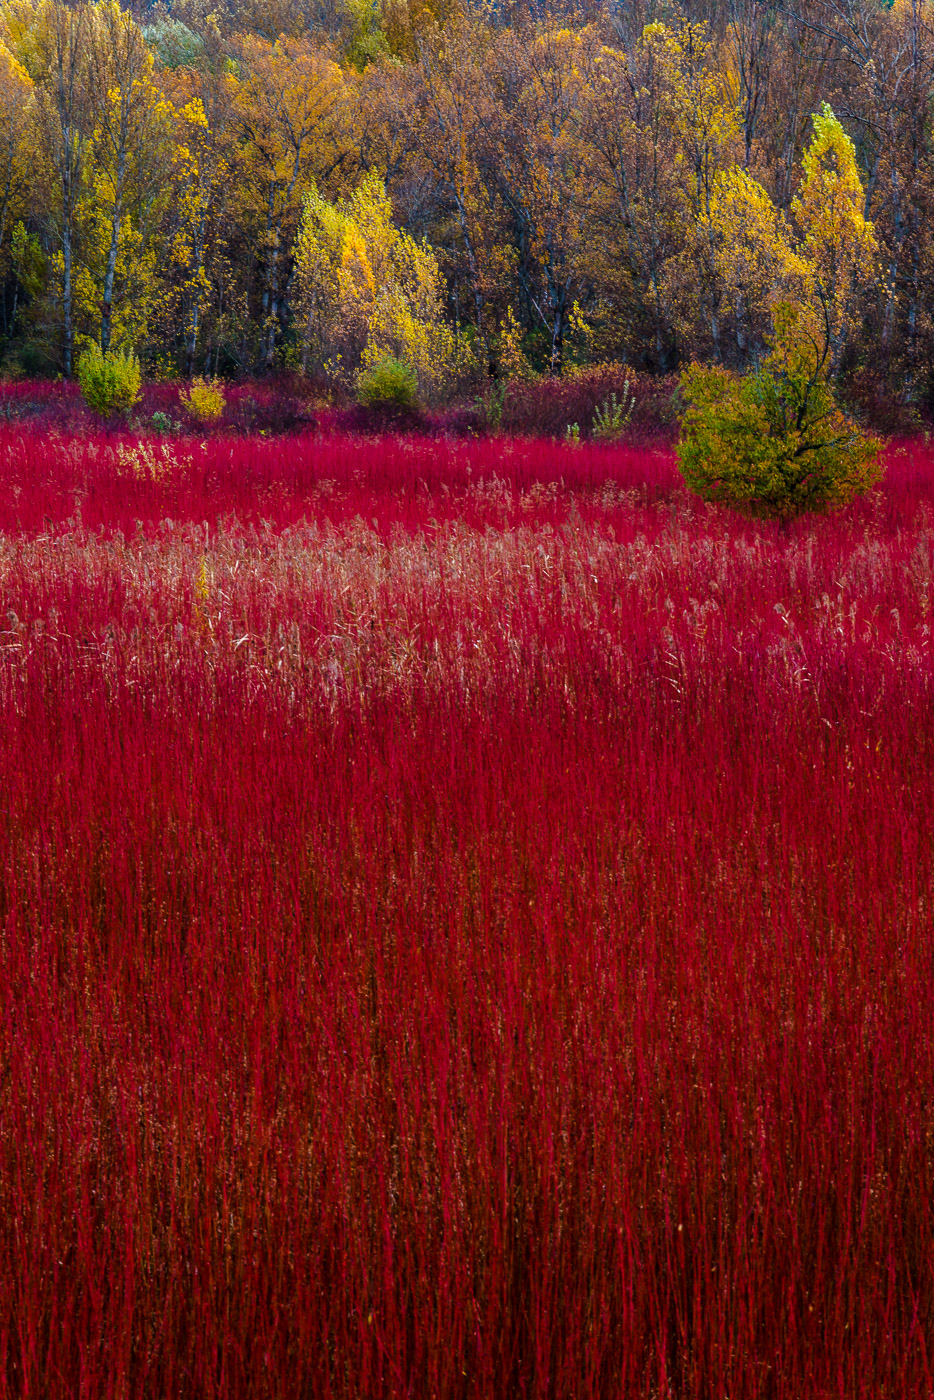 Mar rojo de la Mancha - Mar rojo de la mancha